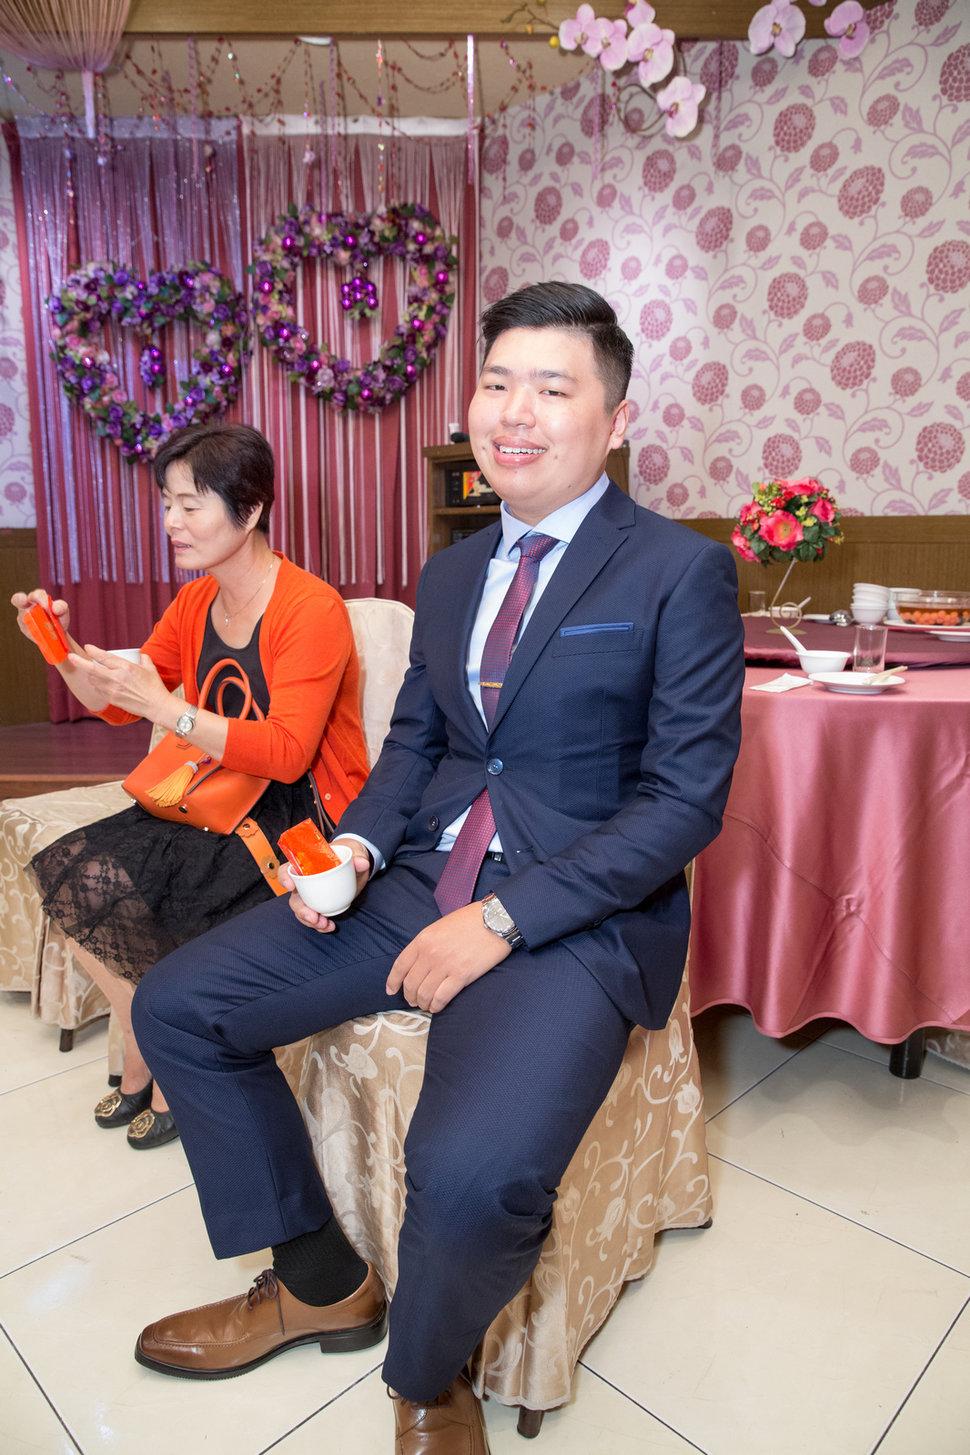 HANK9484 - 蛋拔婚禮紀錄 - 結婚吧